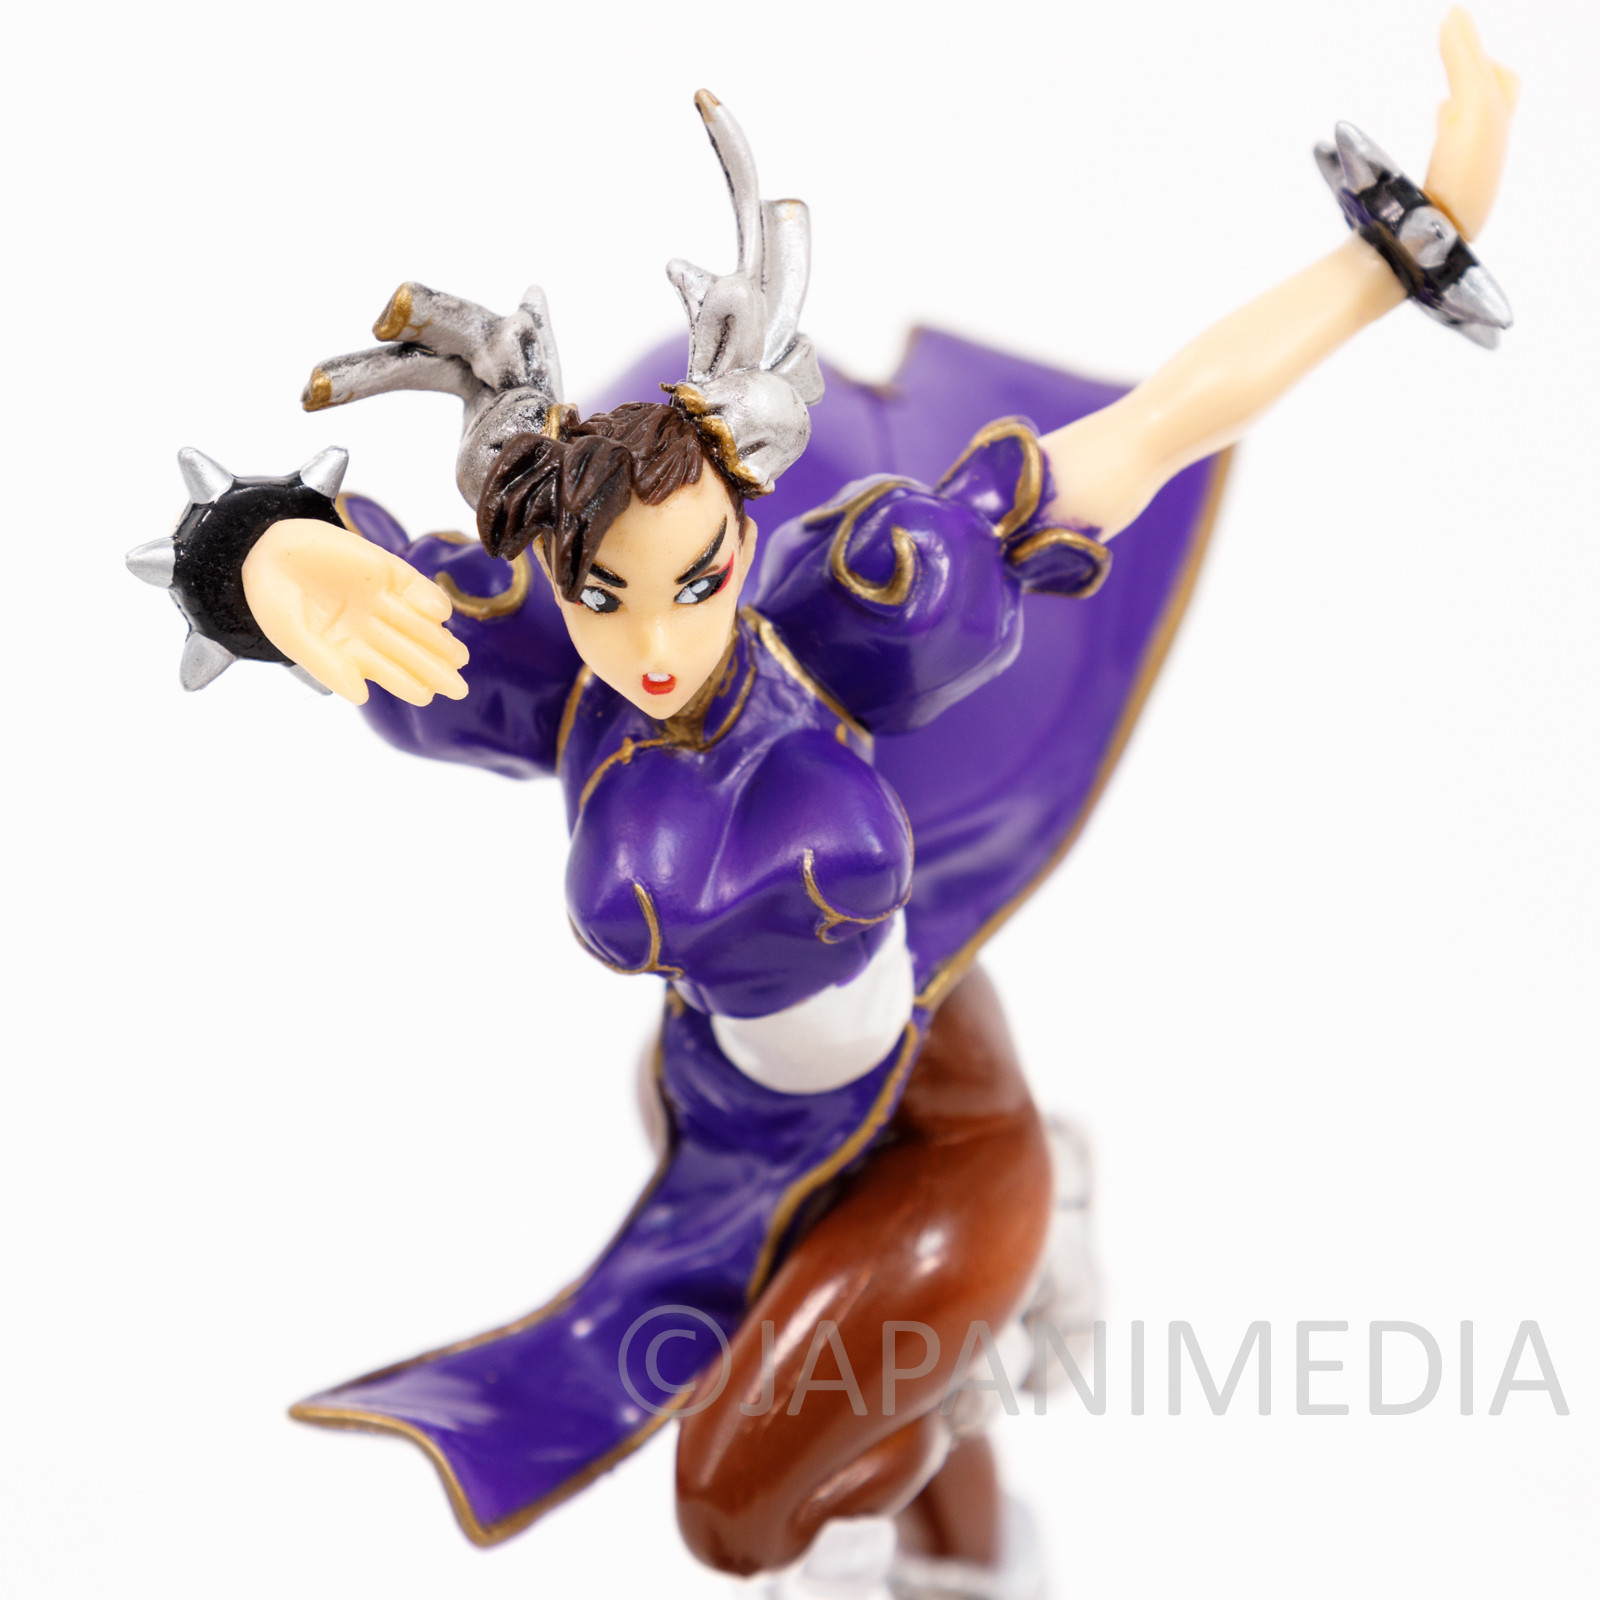 Street Fighter 2 Chun-Li Purple ver Capcom Figure Collection JAPAN GAME